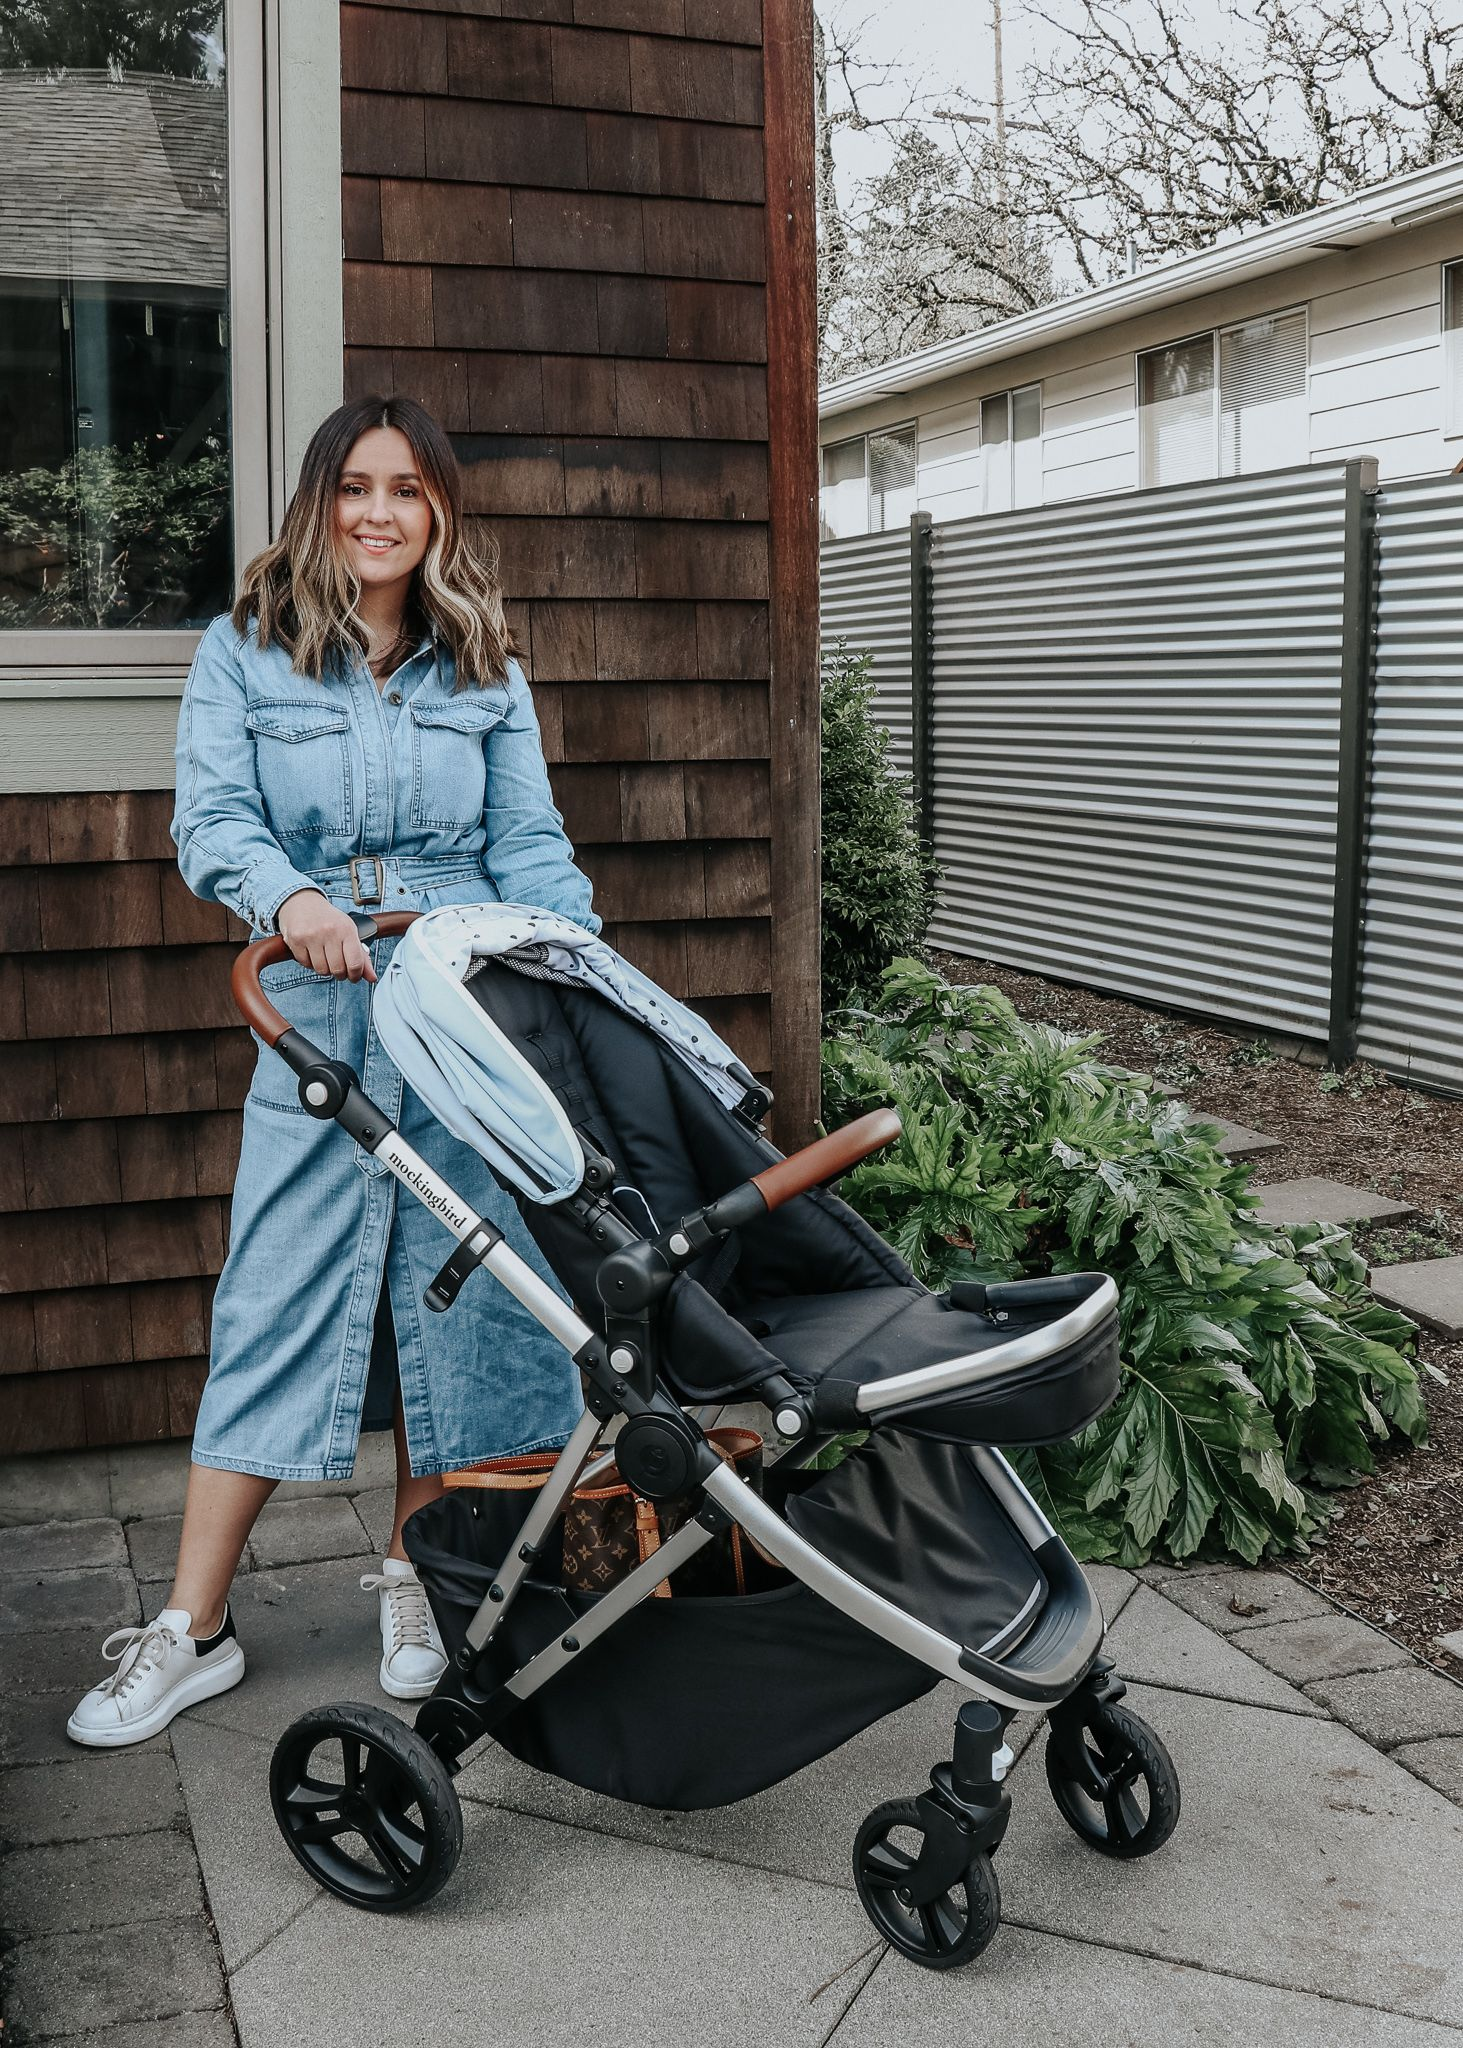 Mockingbird Stroller Review + Video Walk Through